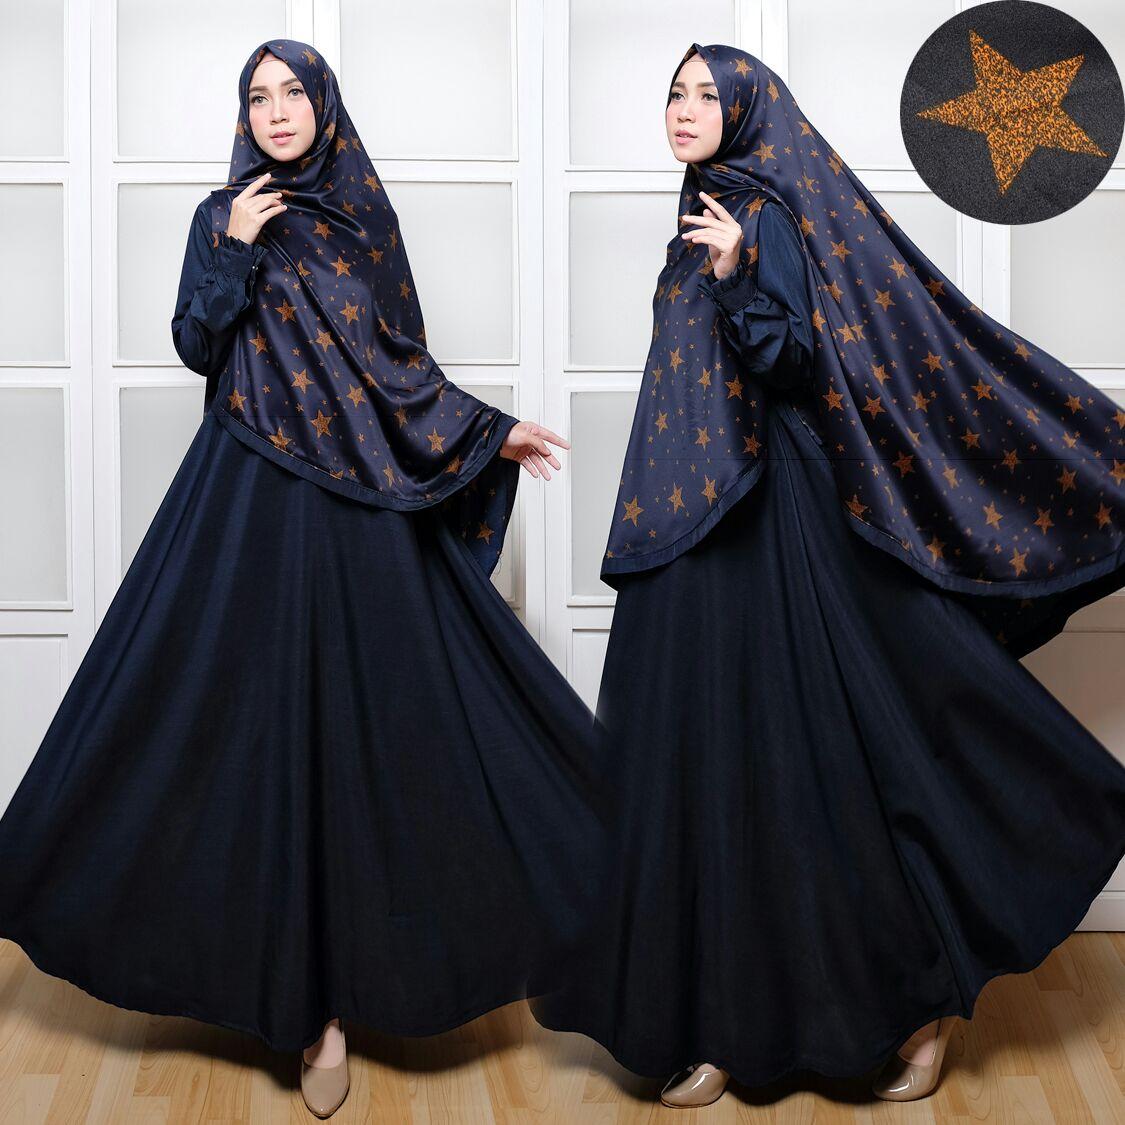 Baju Gamis Maxmara Motif Bintang Busana Muslim Hitam Butik Jingga